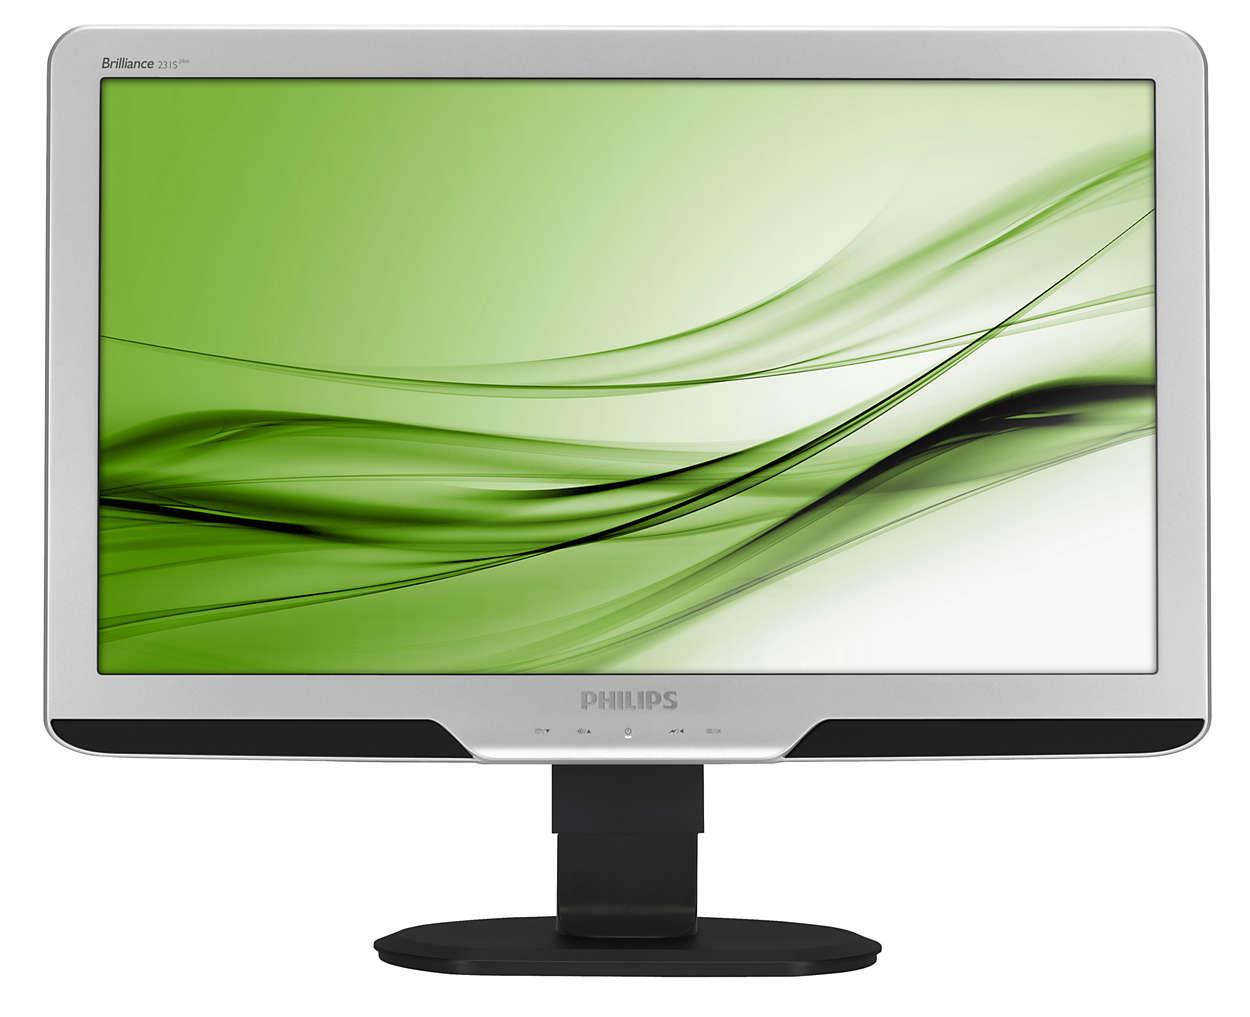 Stor ergonomisk skærm øger produktiviteten